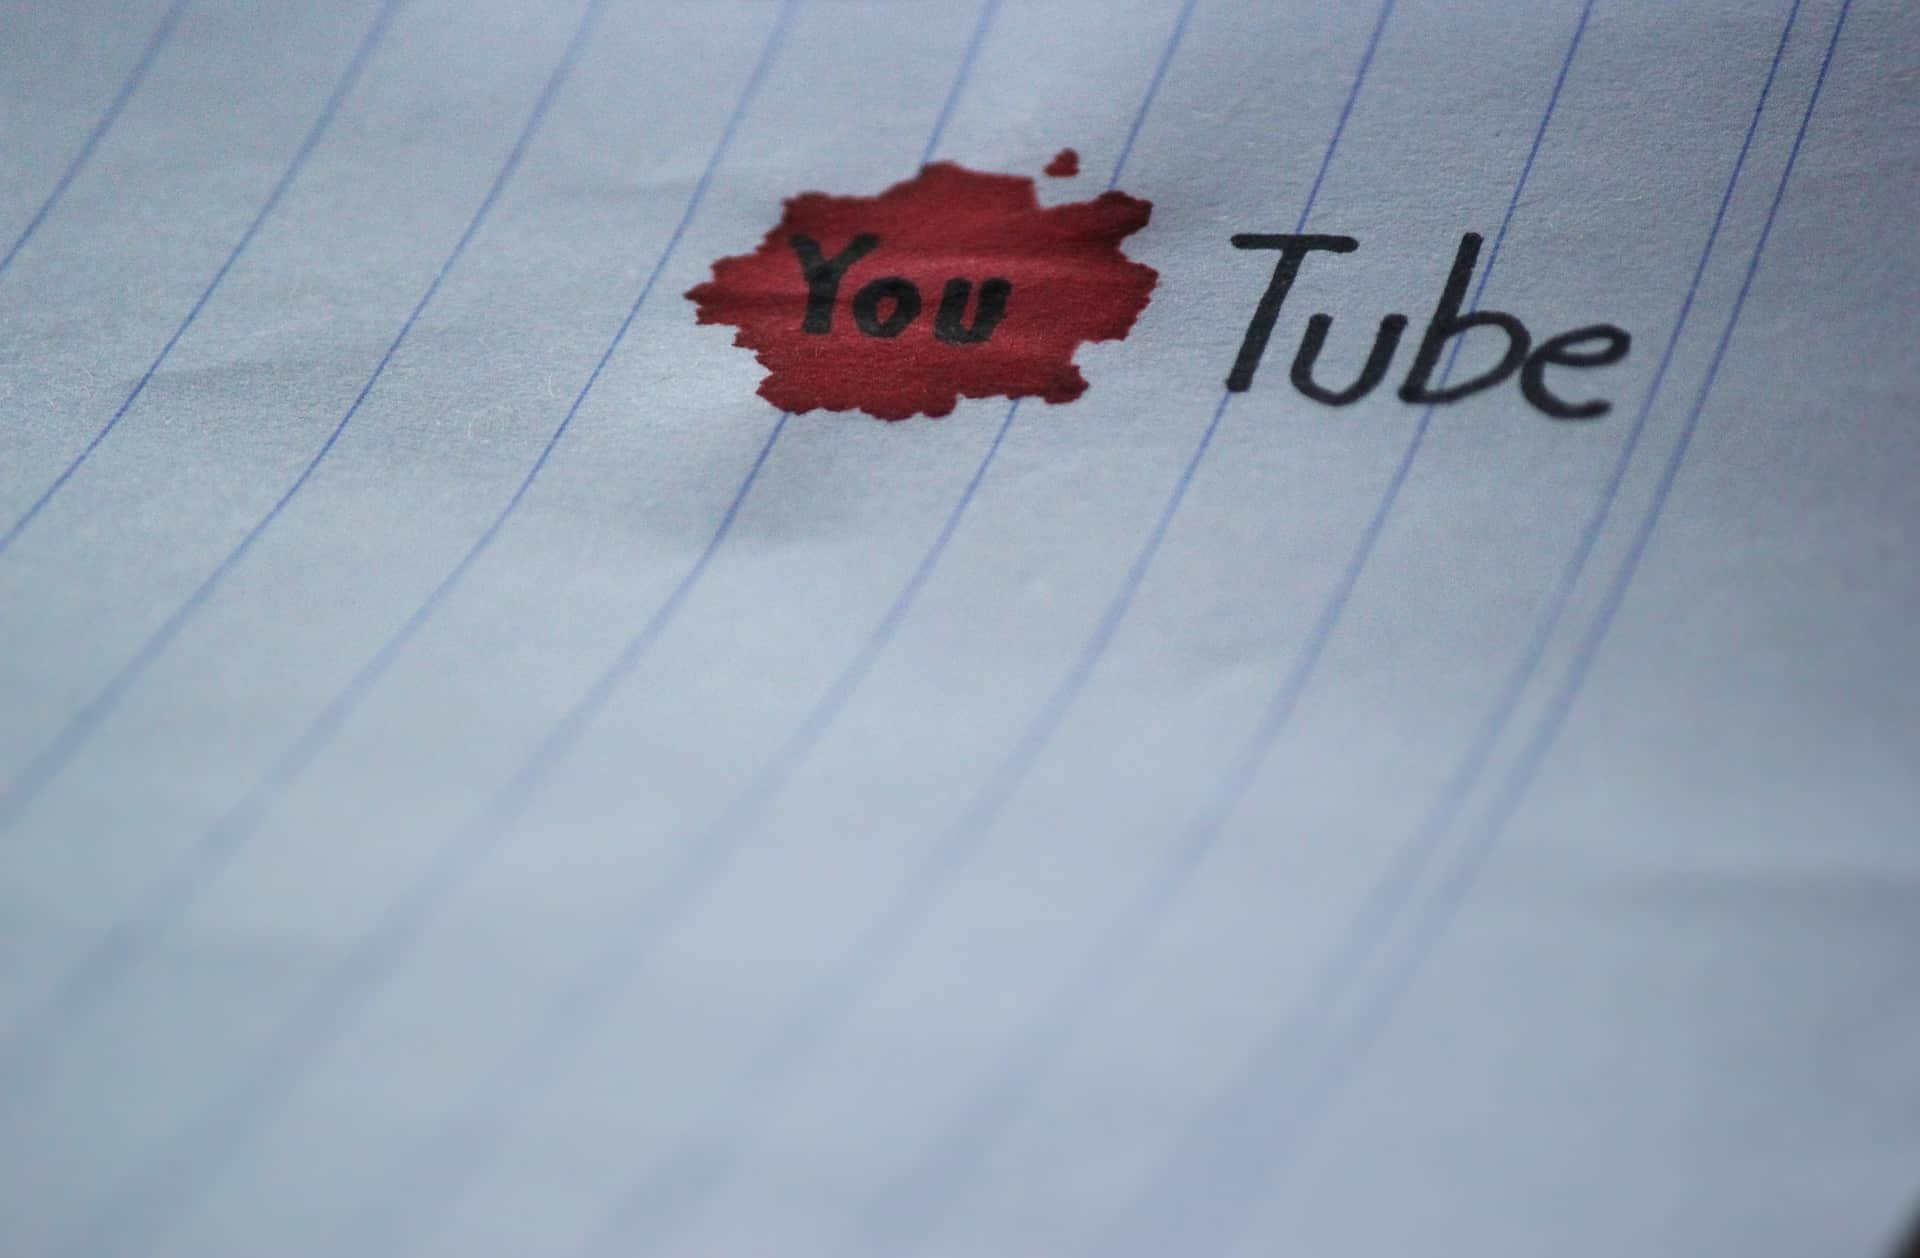 educate customers using youtube